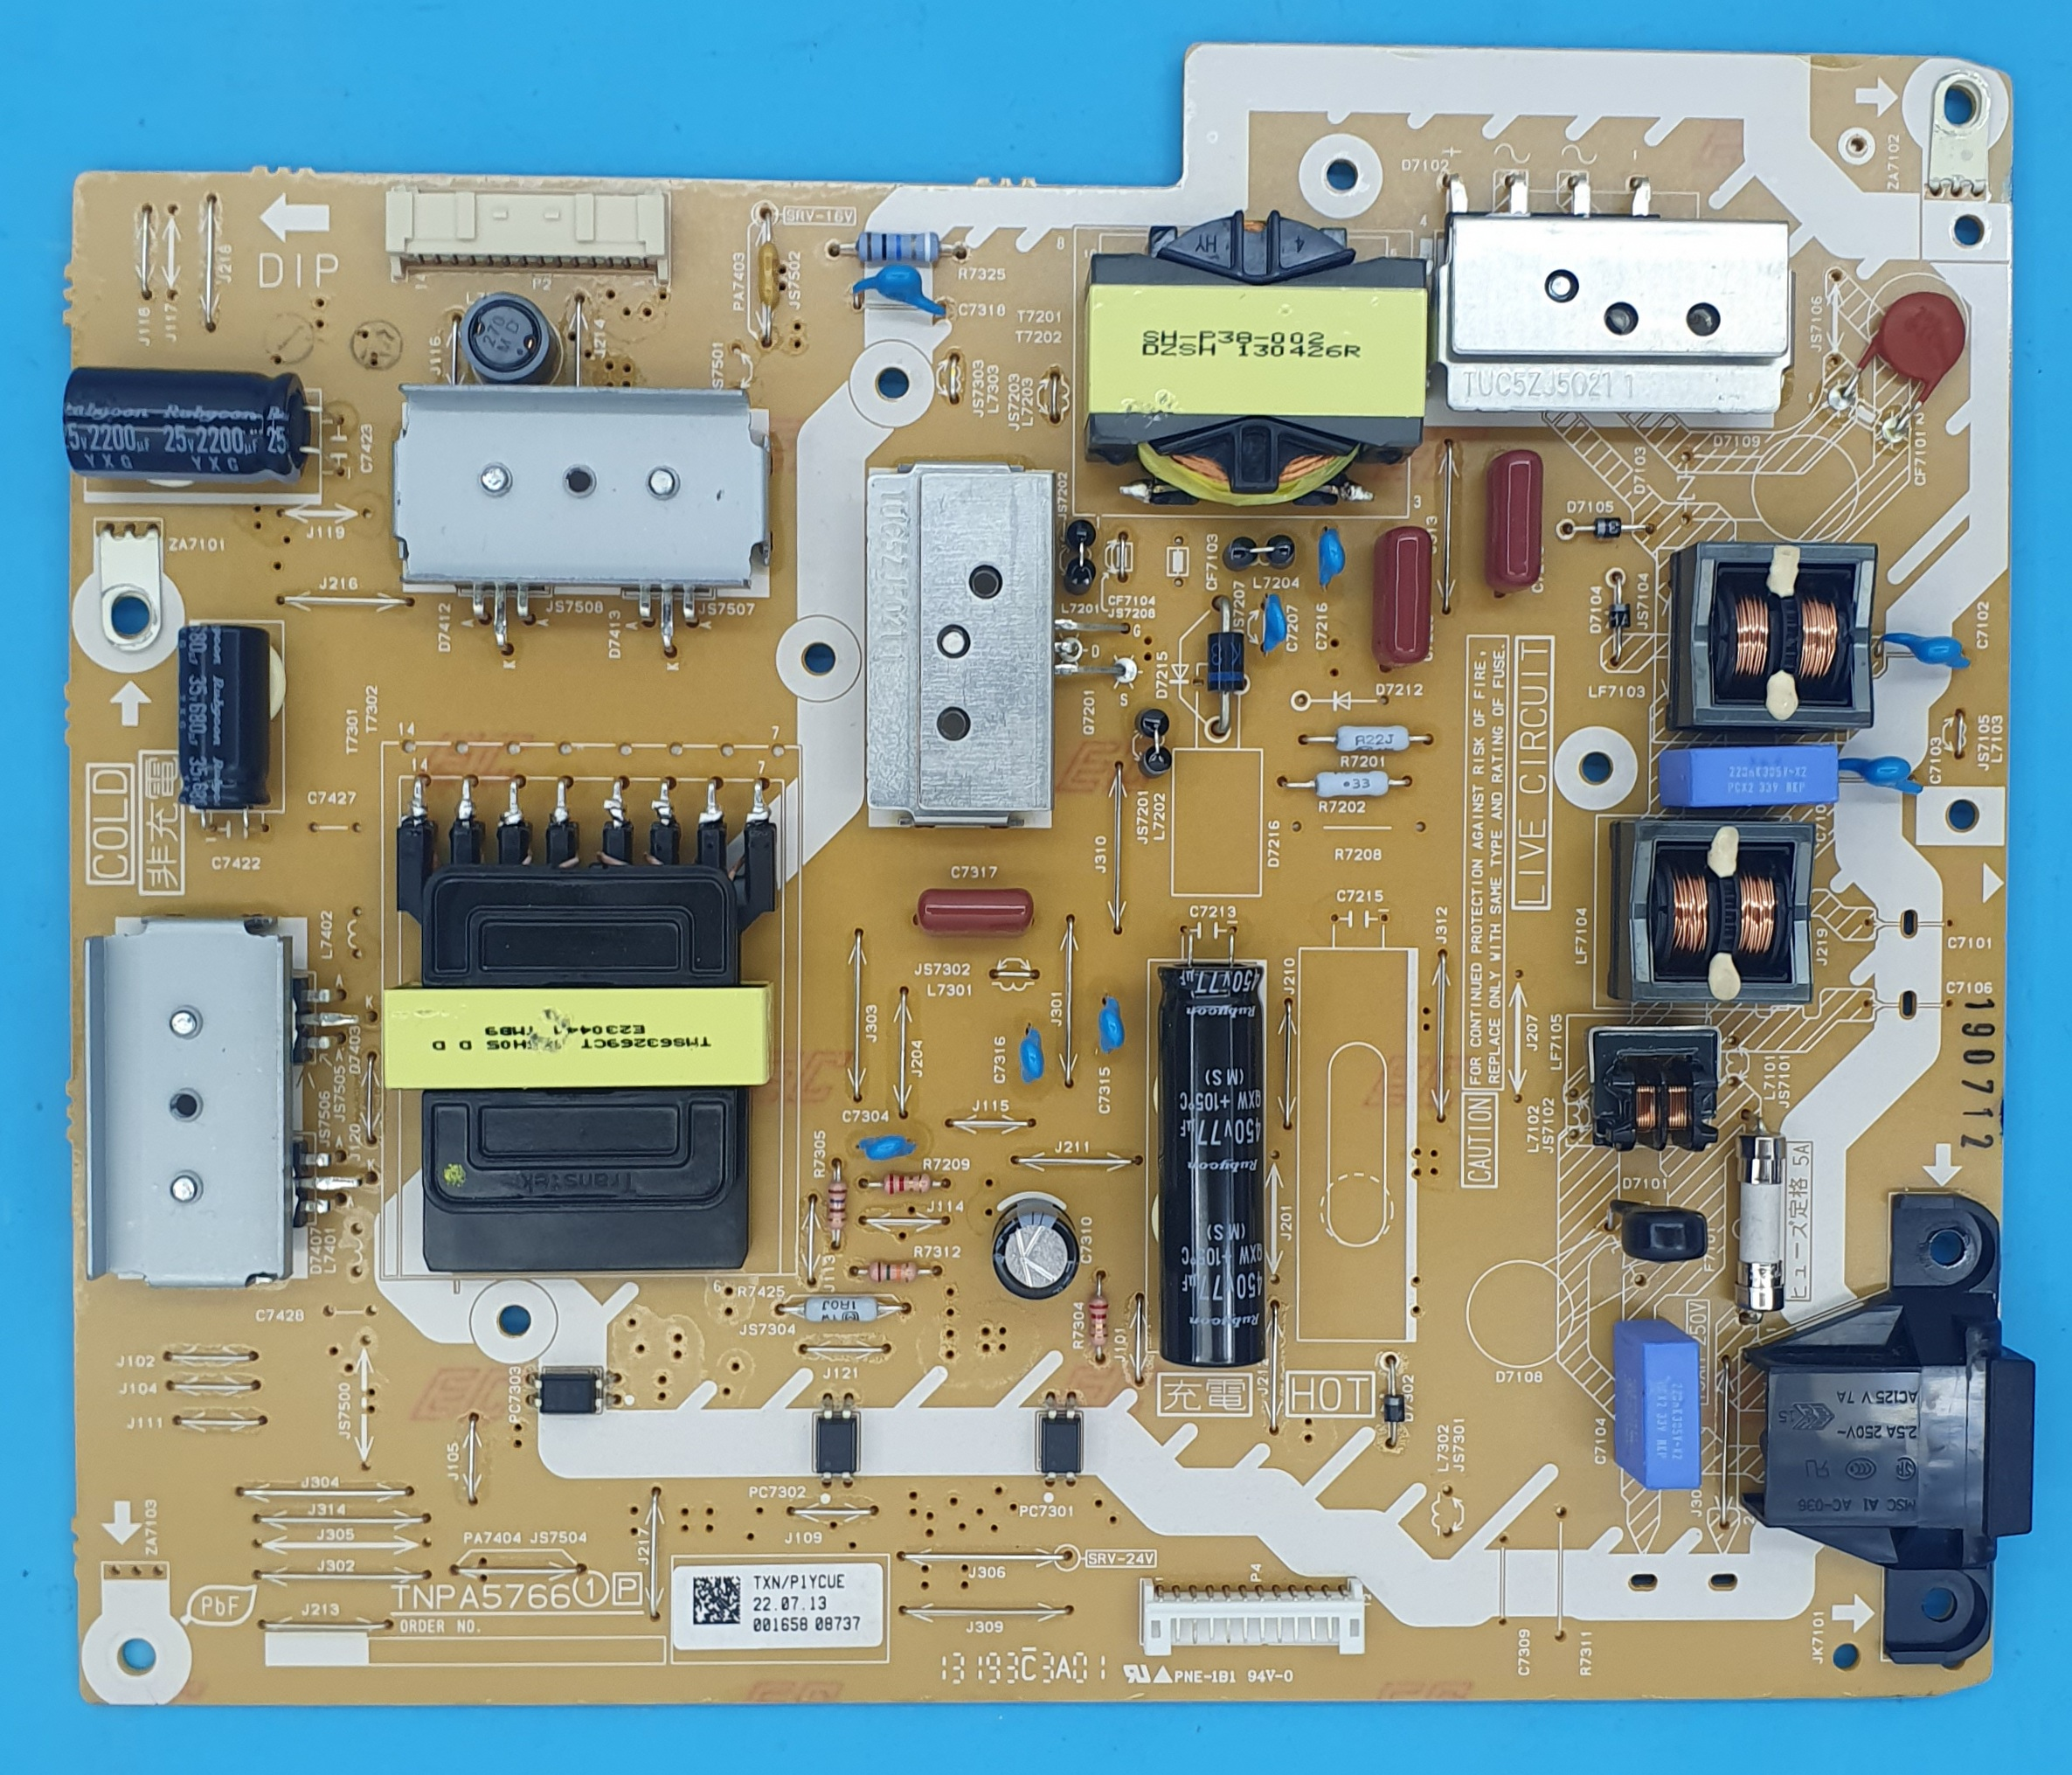 TNPA5766 Panasonic Power (KDV DAHİL = 150 TL)